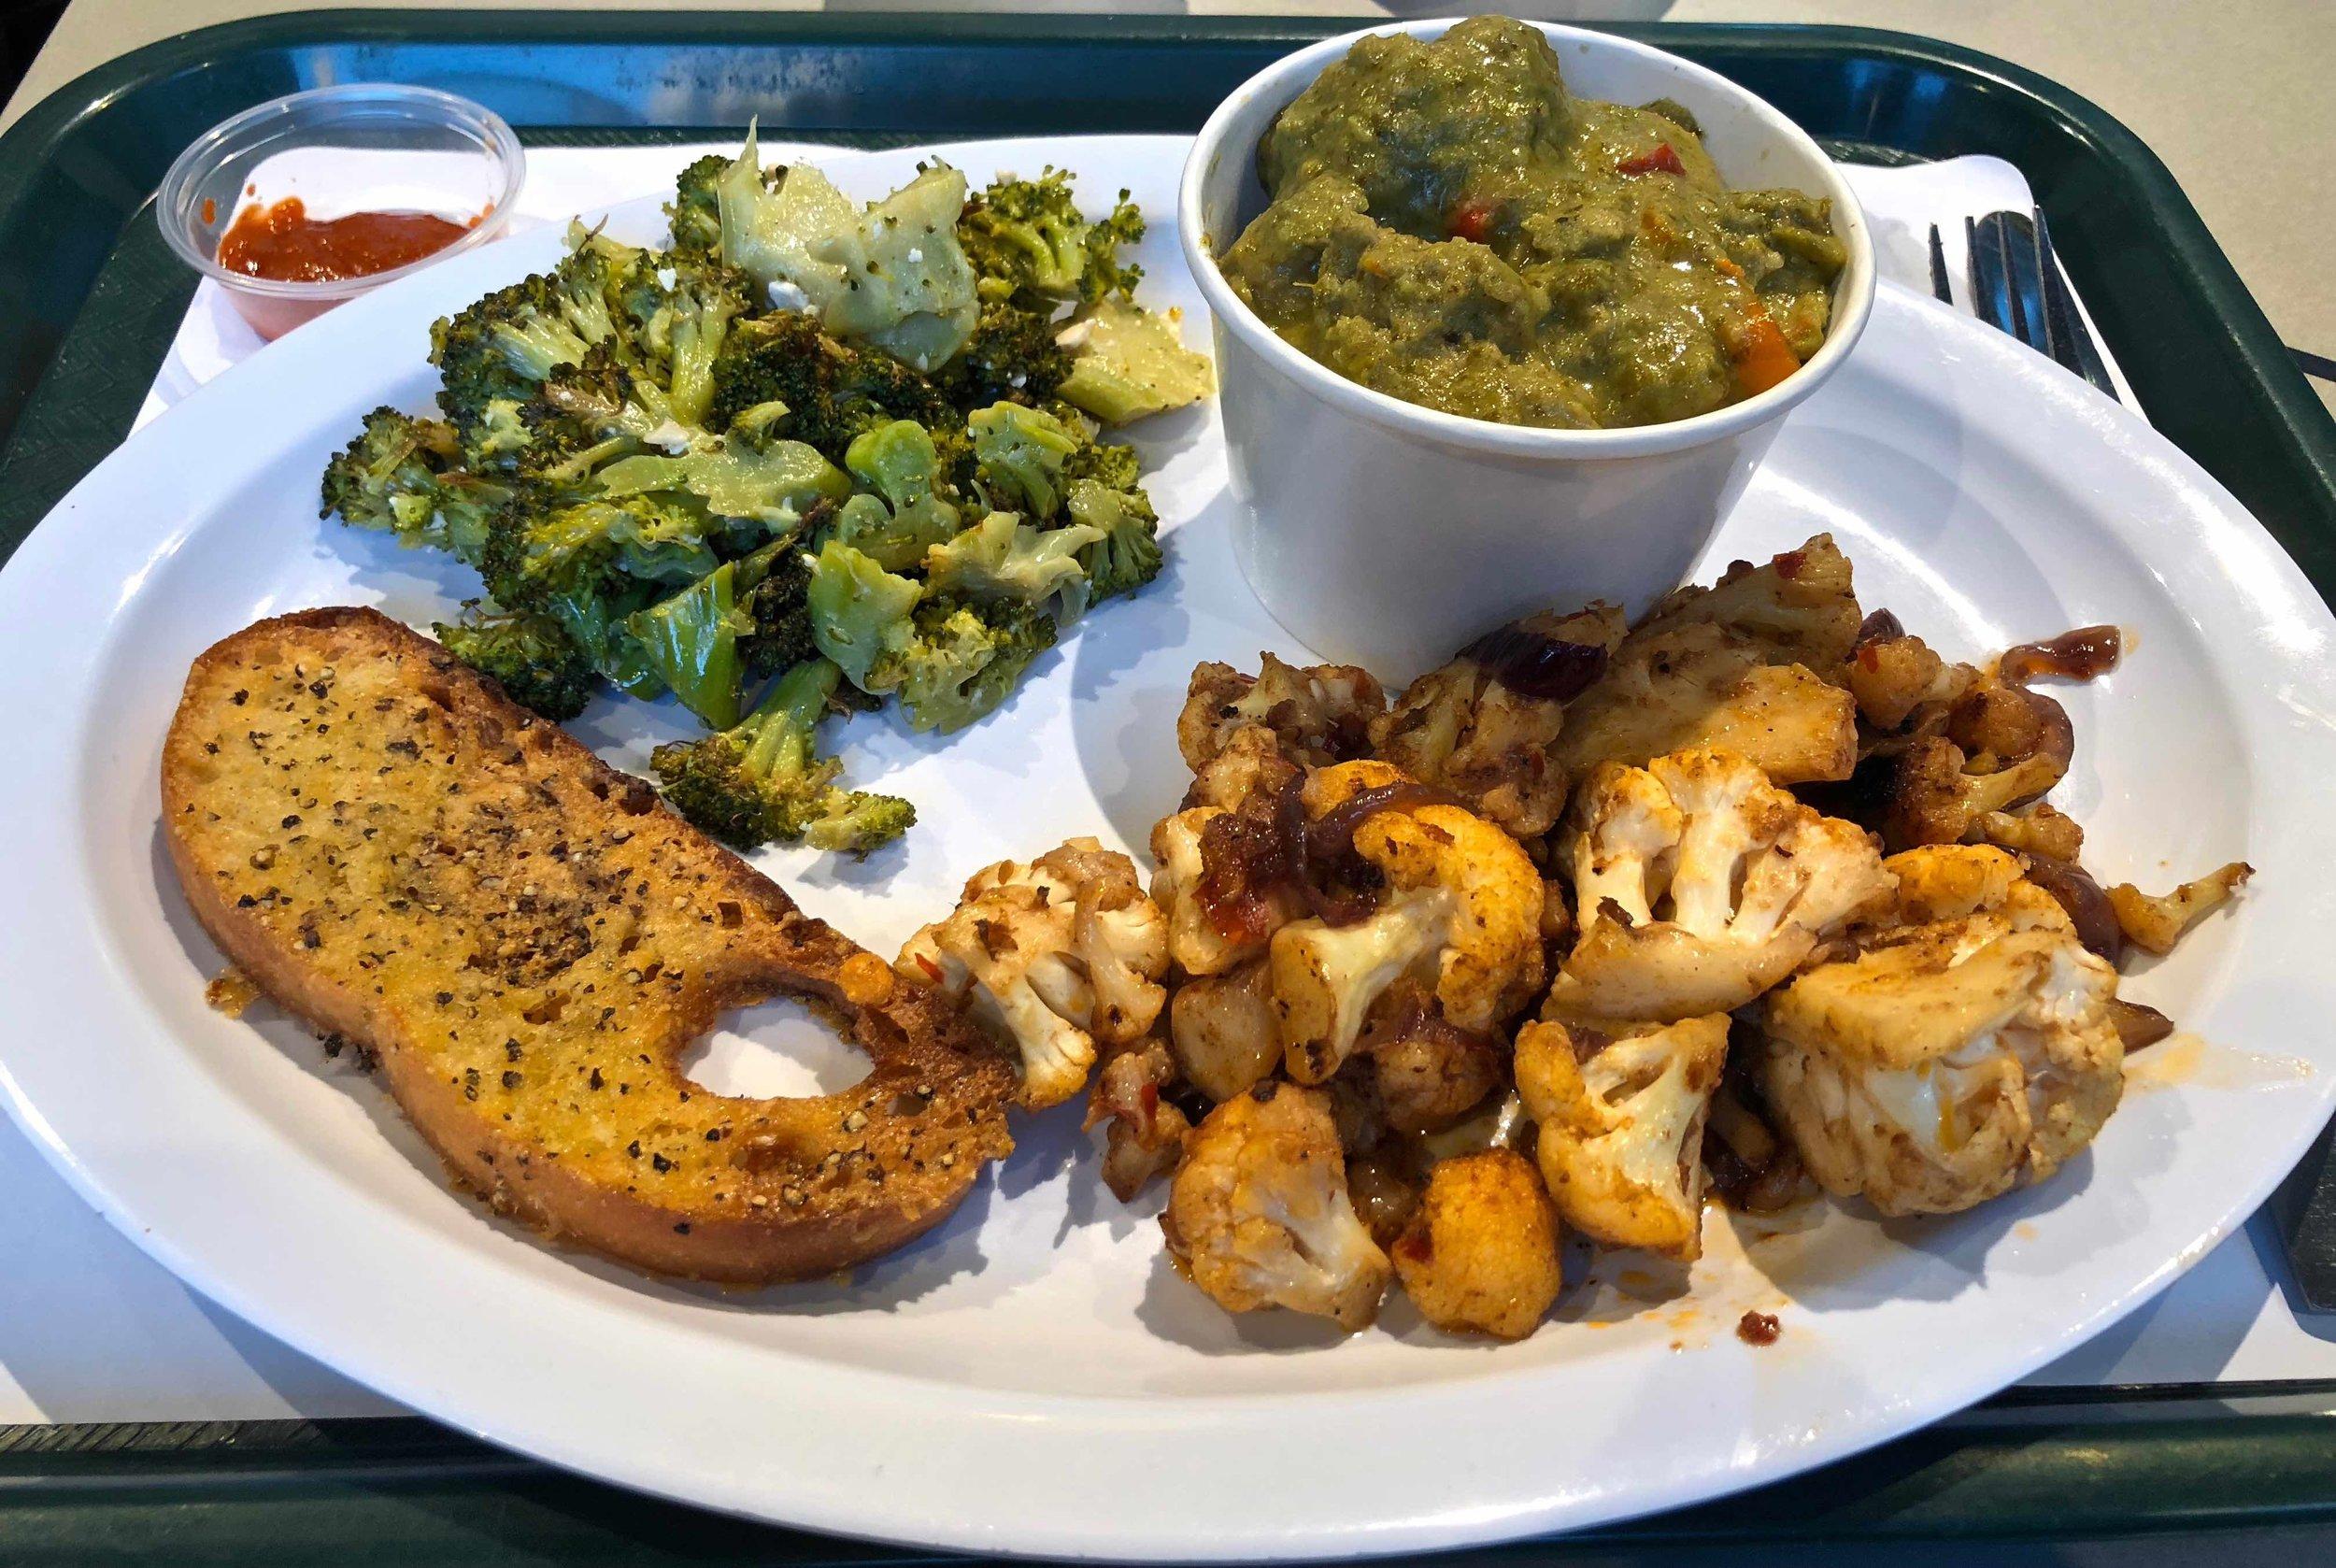 broccoli, cauliflower and green curry chicken meatballs